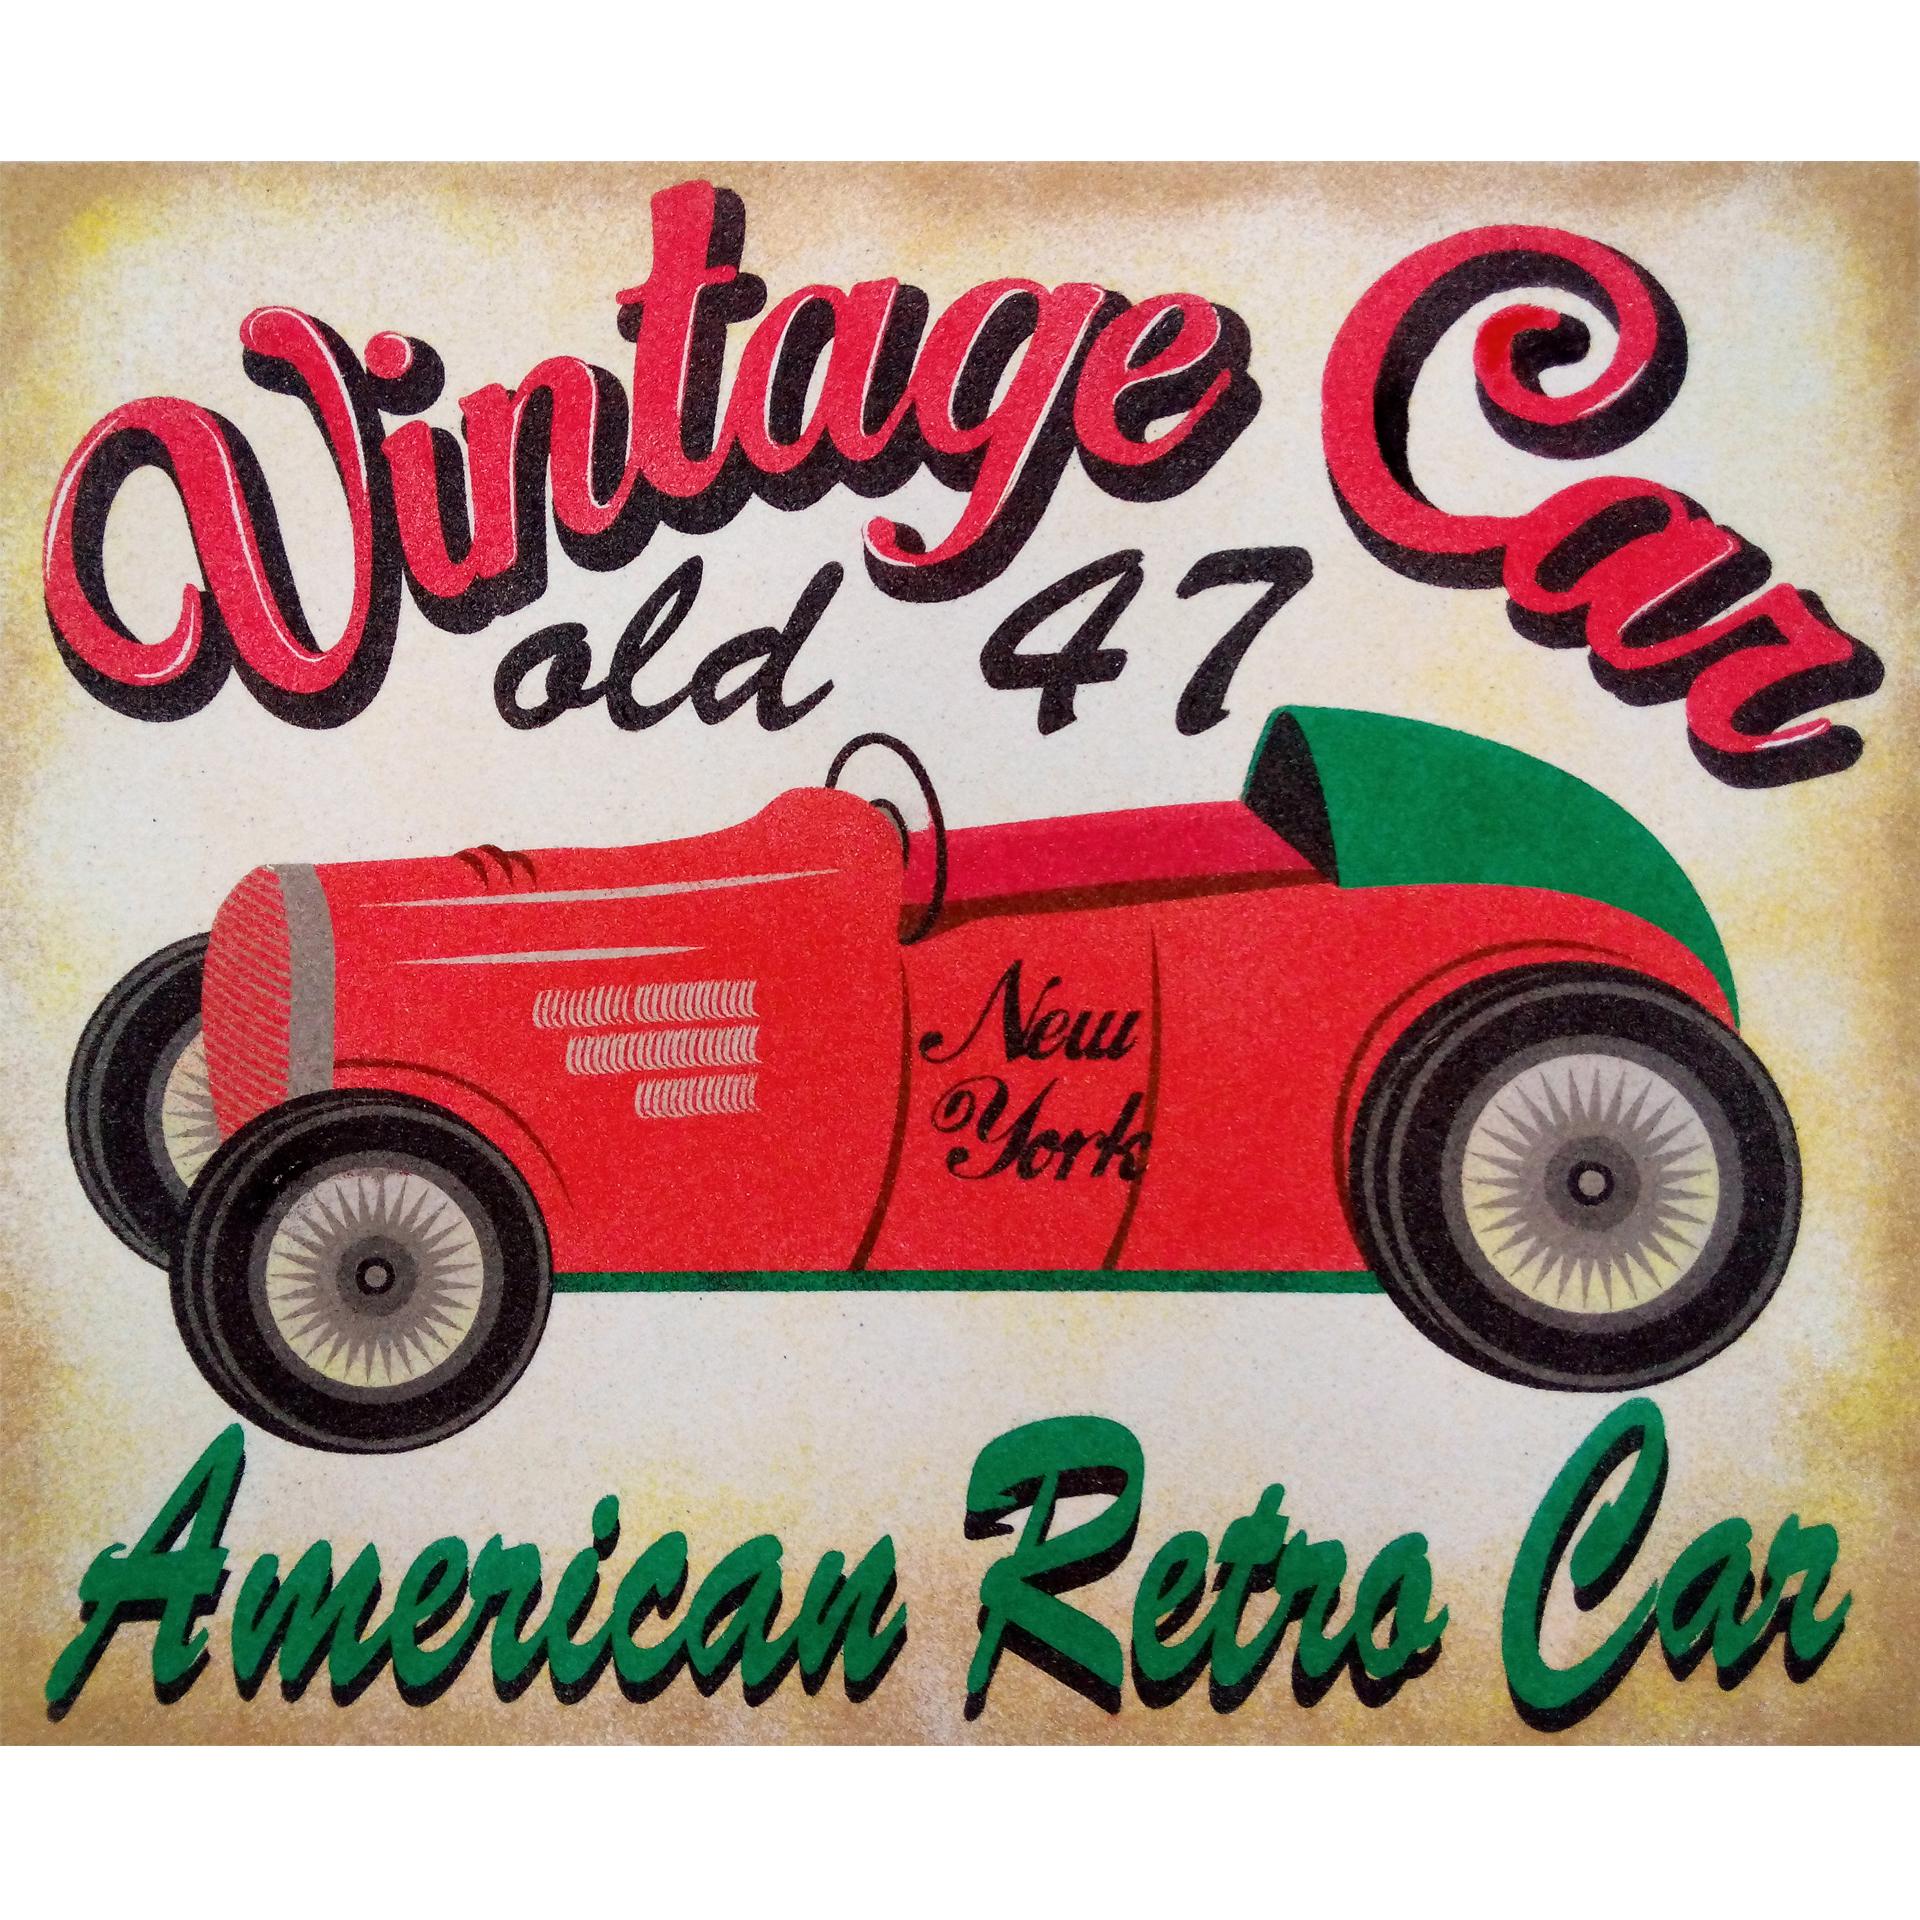 Vintage Car Old 47. 2 medidas disponibles